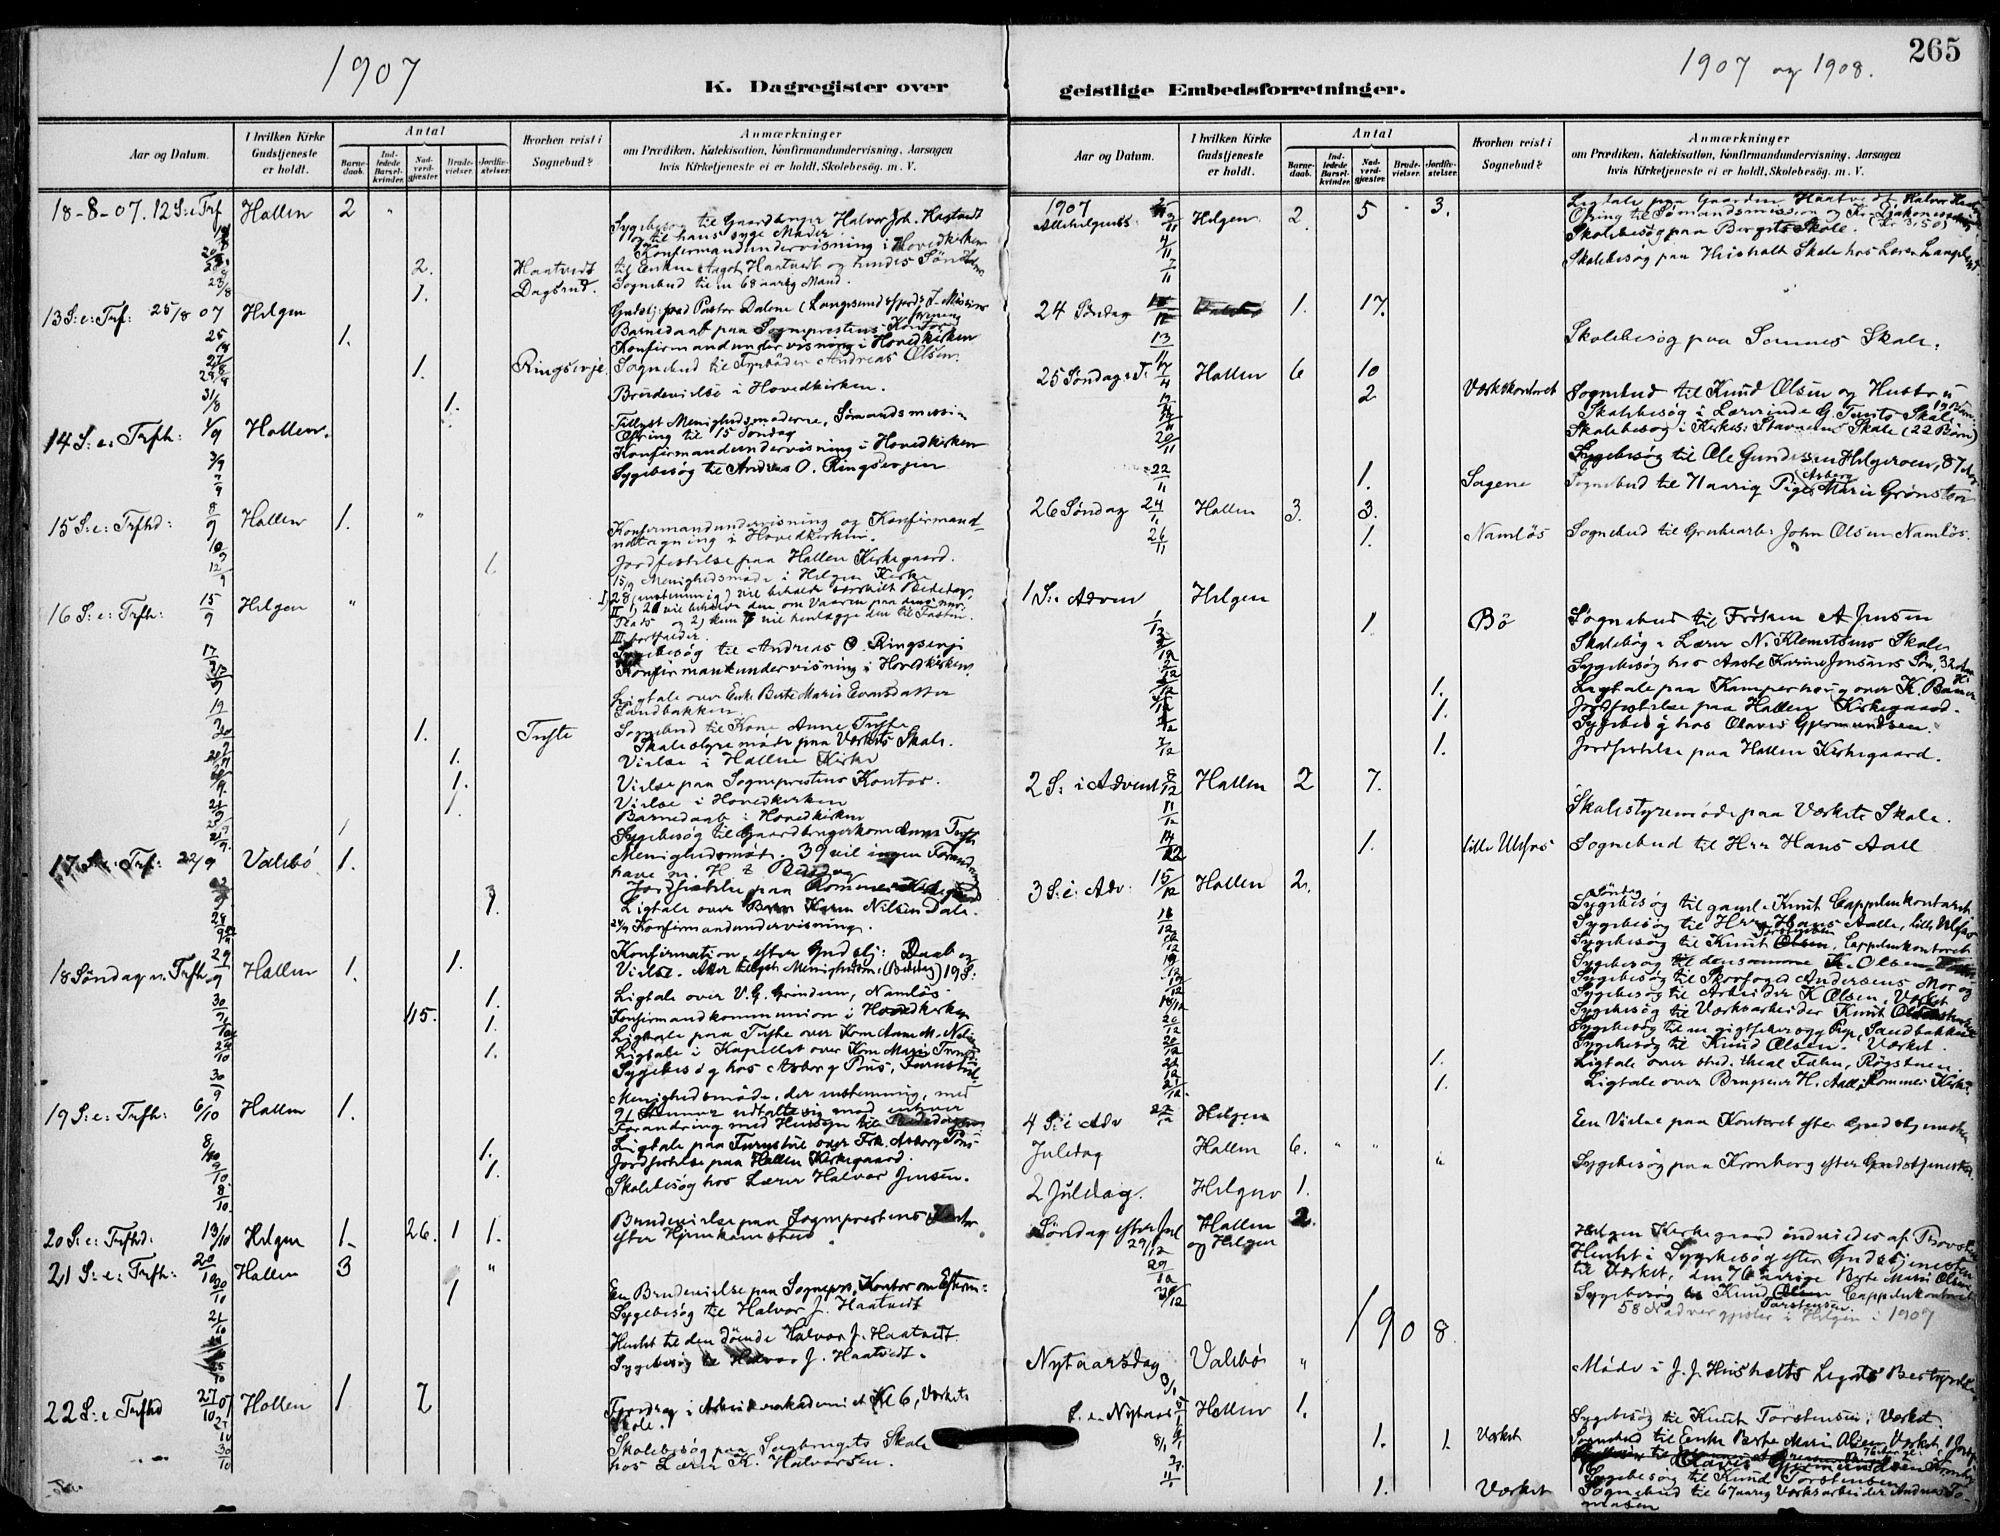 SAKO, Holla kirkebøker, F/Fa/L0012: Ministerialbok nr. 12, 1907-1923, s. 265